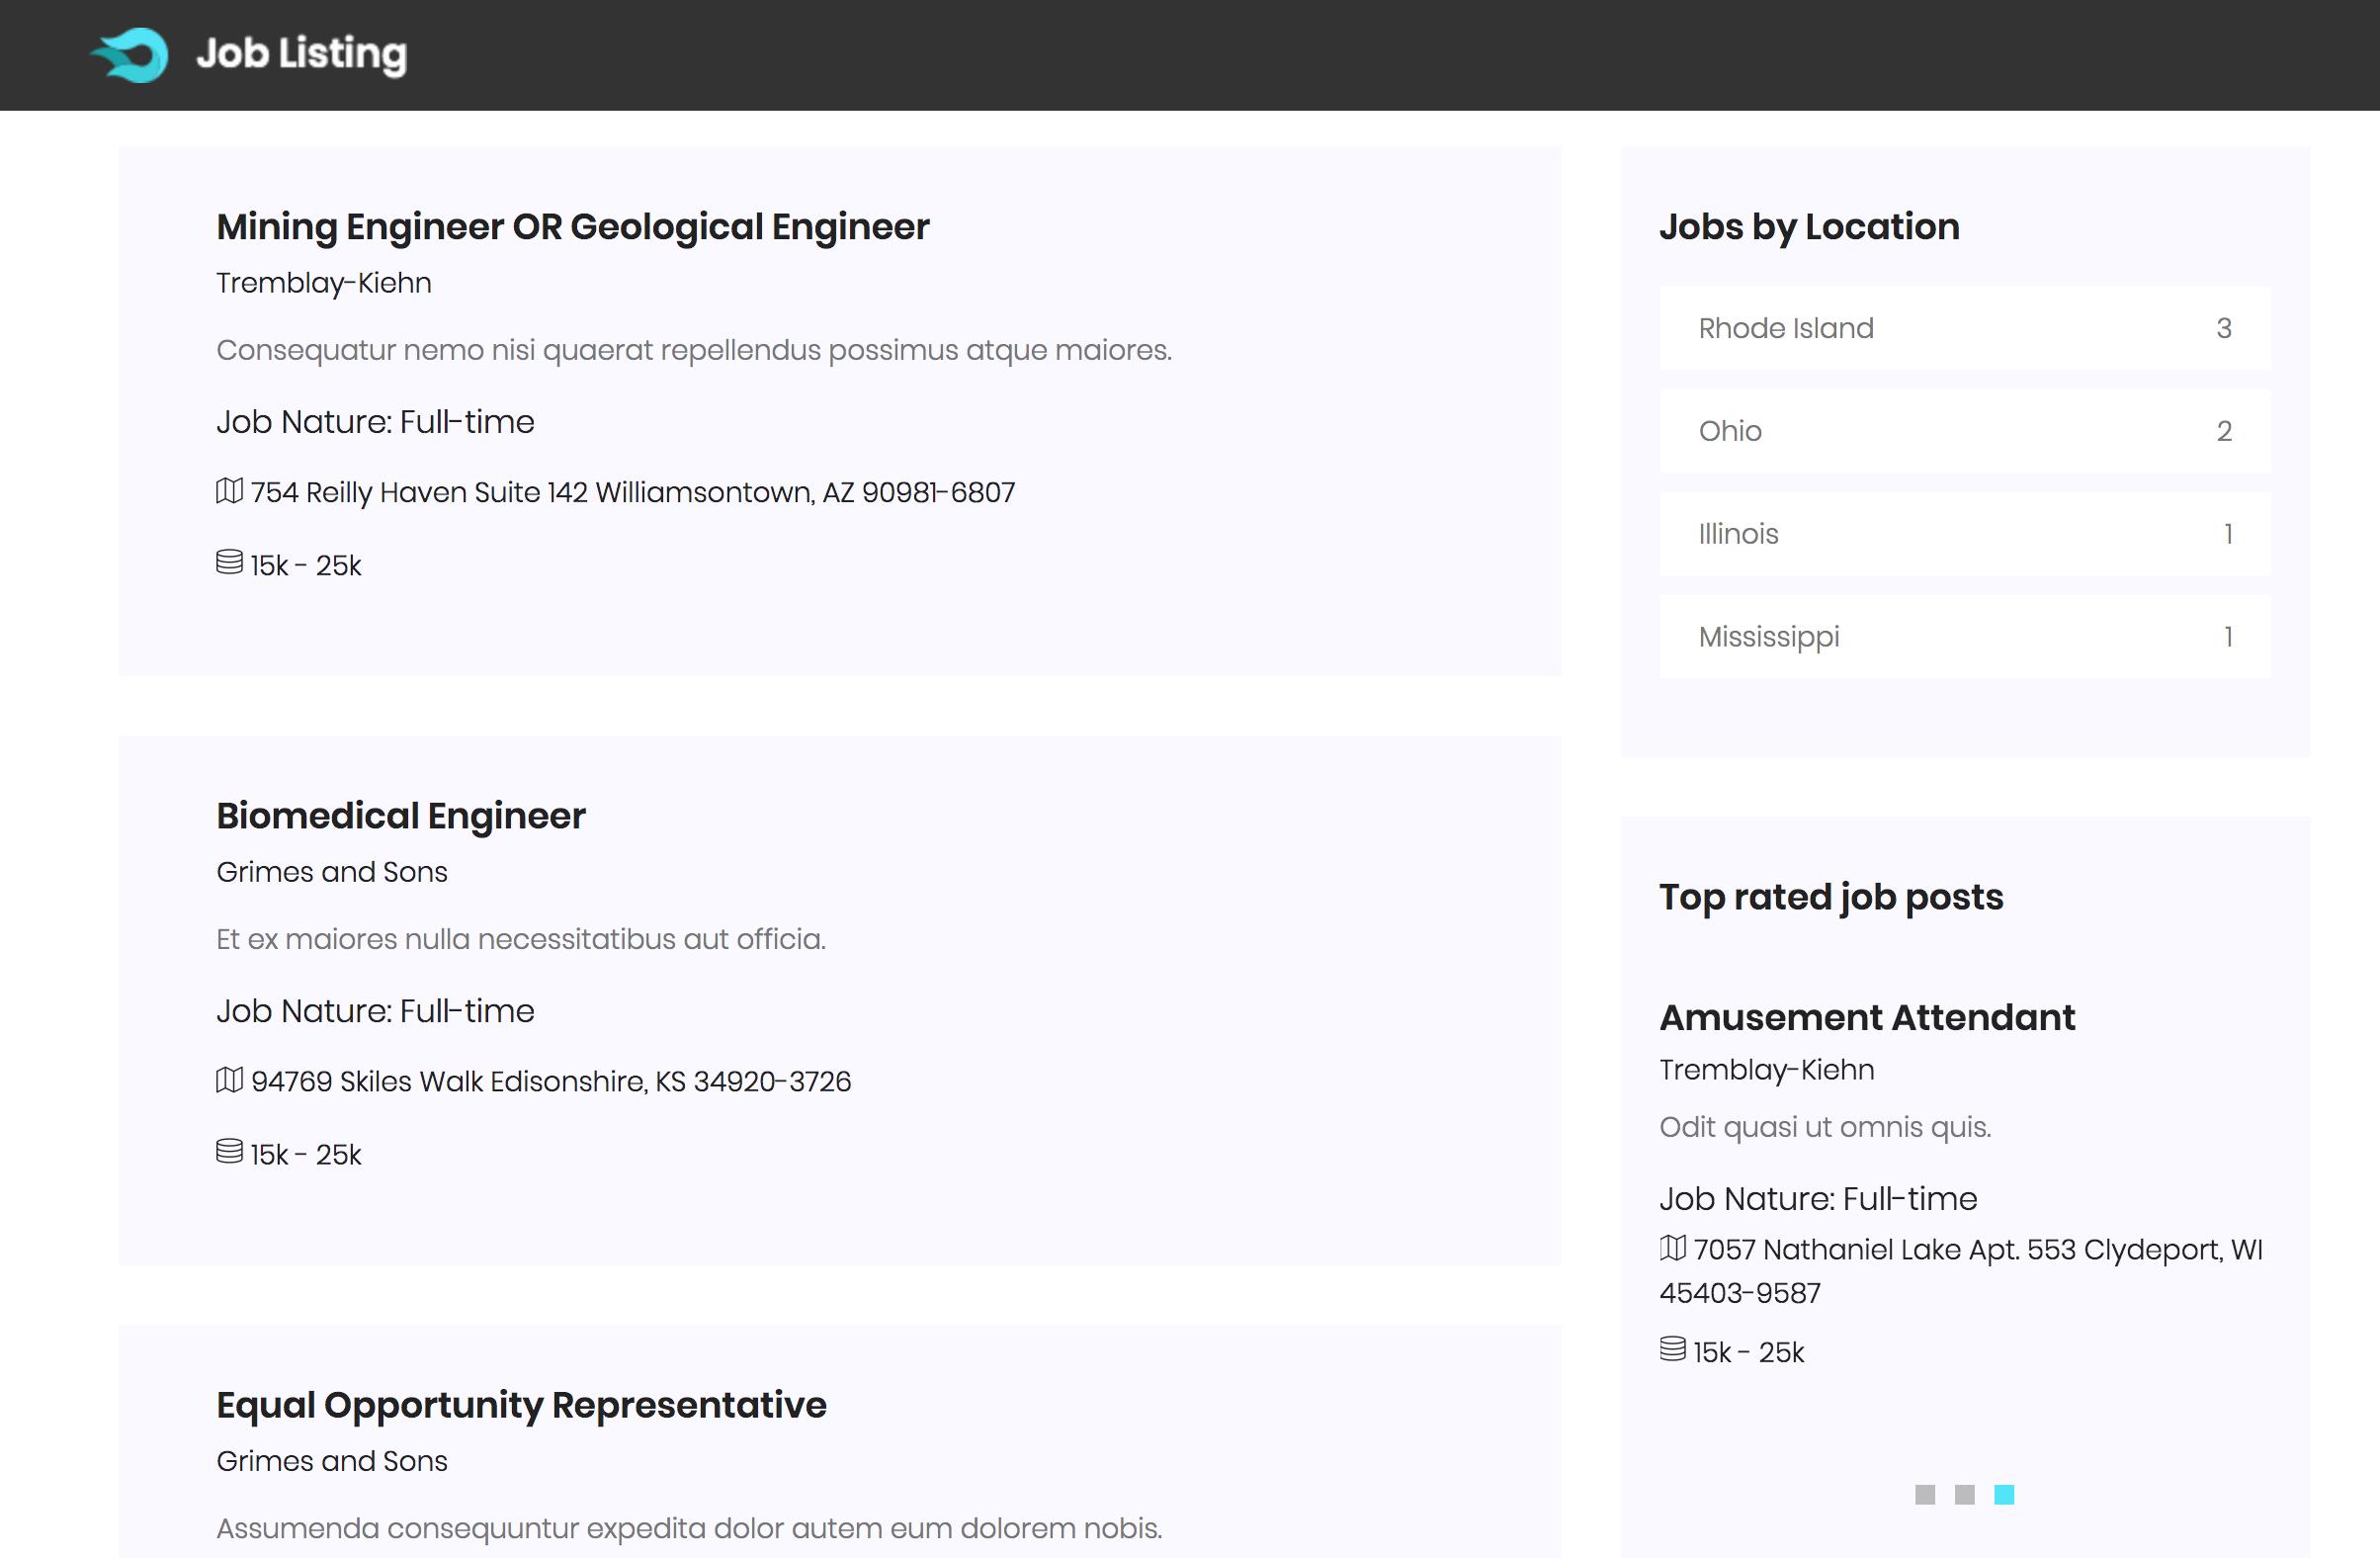 Laravel Job Listings Results